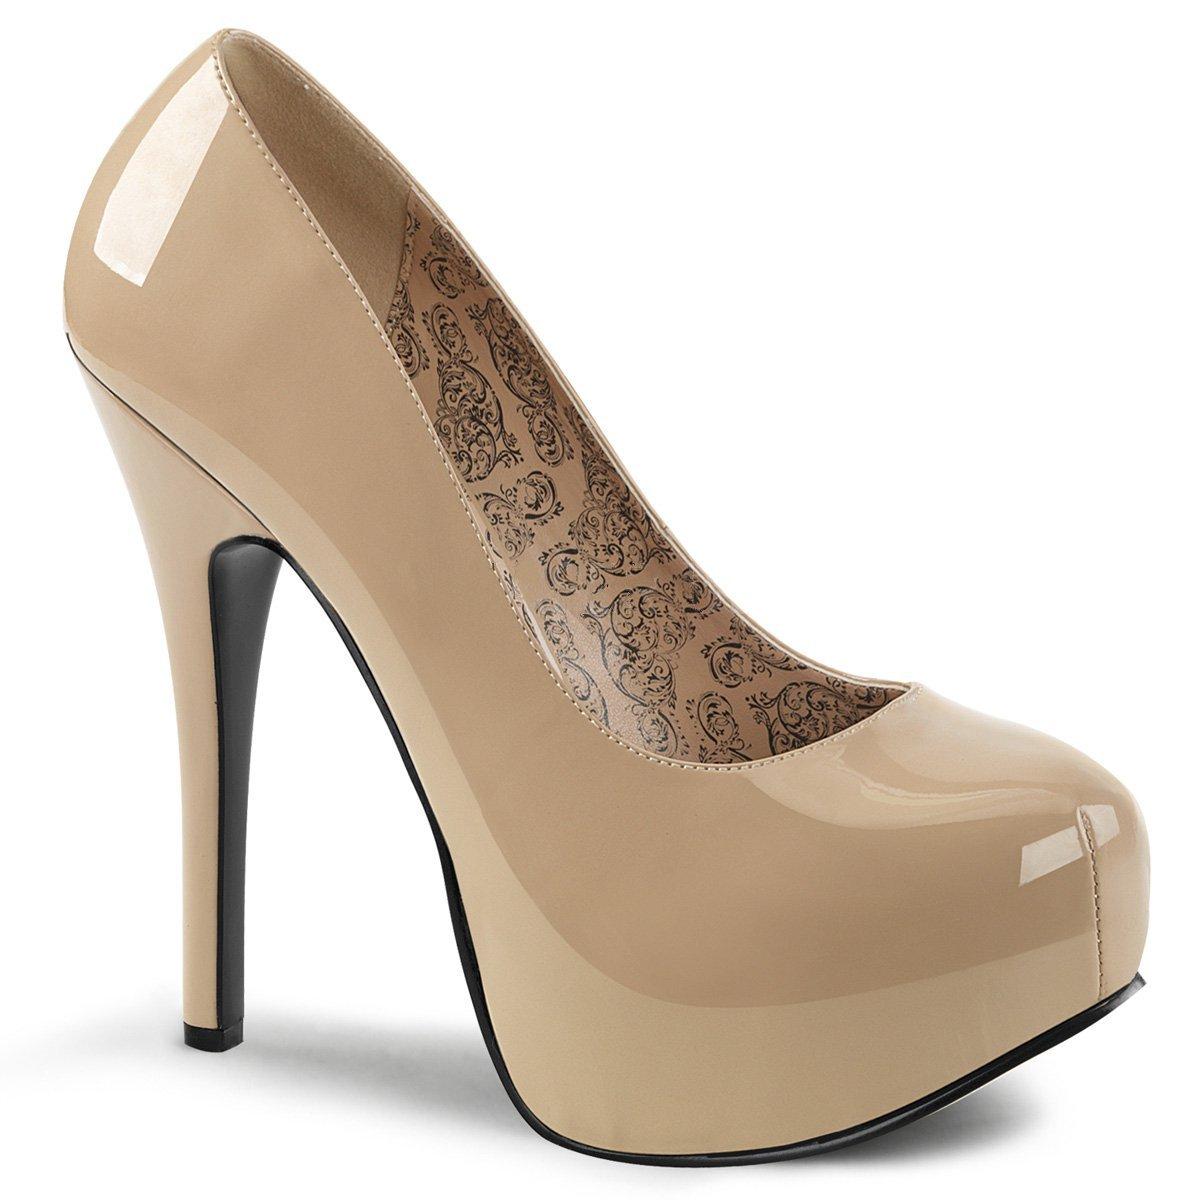 Bordello Pleaser Pink Label TEEZE-06W Women 5 3/4 Heel, 1 3/4 Platform Pump W/Concealed Platform B075R7QBZT 16 B(M) US|Cream Pat